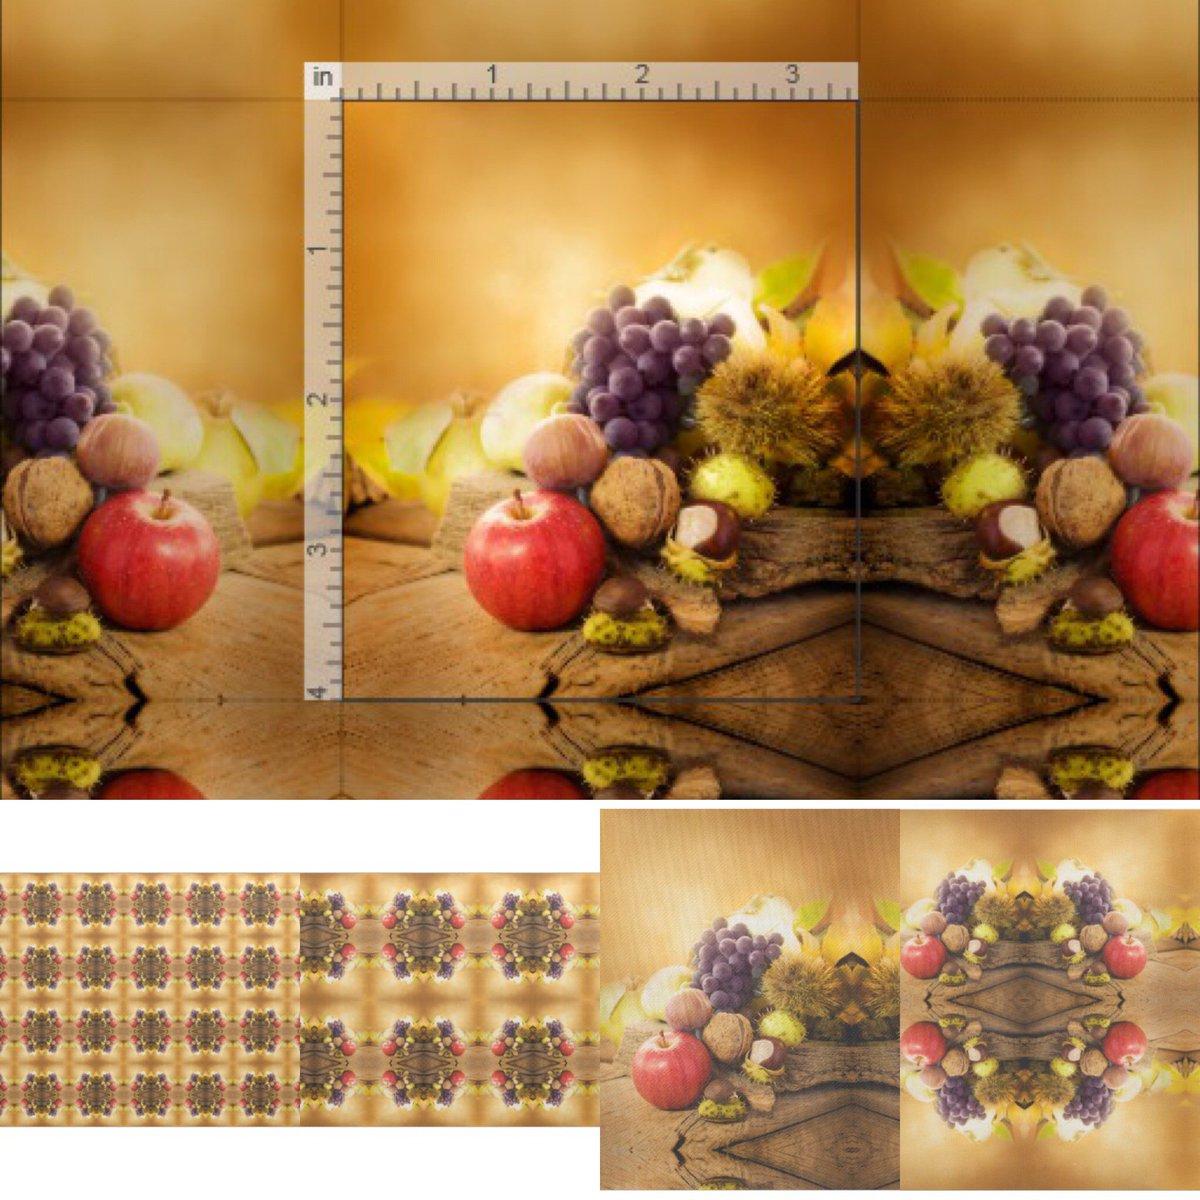 #Thanksgiving #Fall #Autumn #Pima #Cotton by the #Yard #Craft #Supplies   http:// klou.tt/ntl37fygkq0h  &nbsp;  <br>http://pic.twitter.com/F7VGJCx6h2